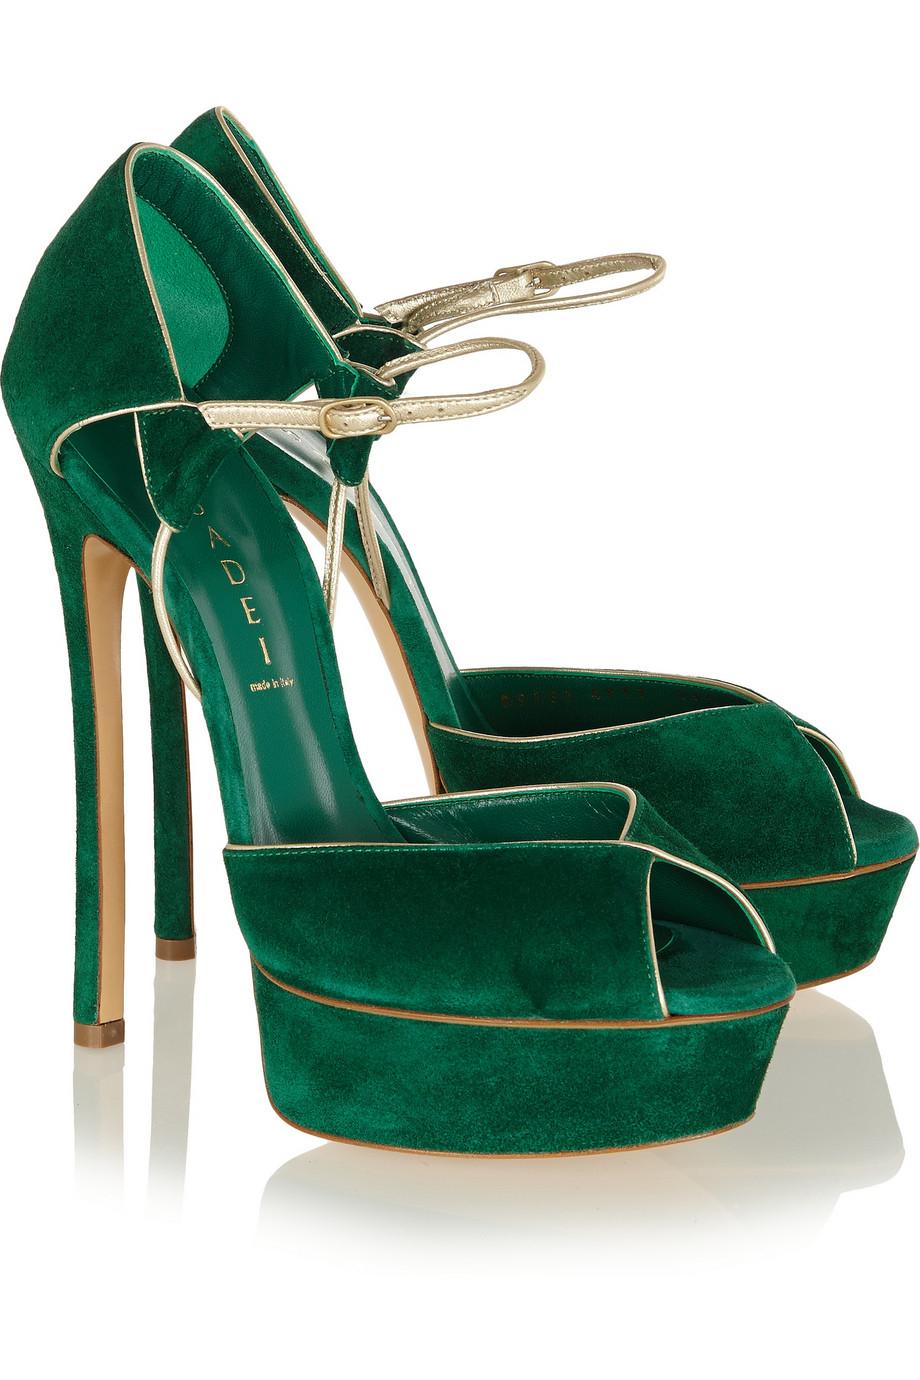 Casadei Woman Knotted Suede Platform Sandals Bright Blue Size 35 Casadei 9zZhz